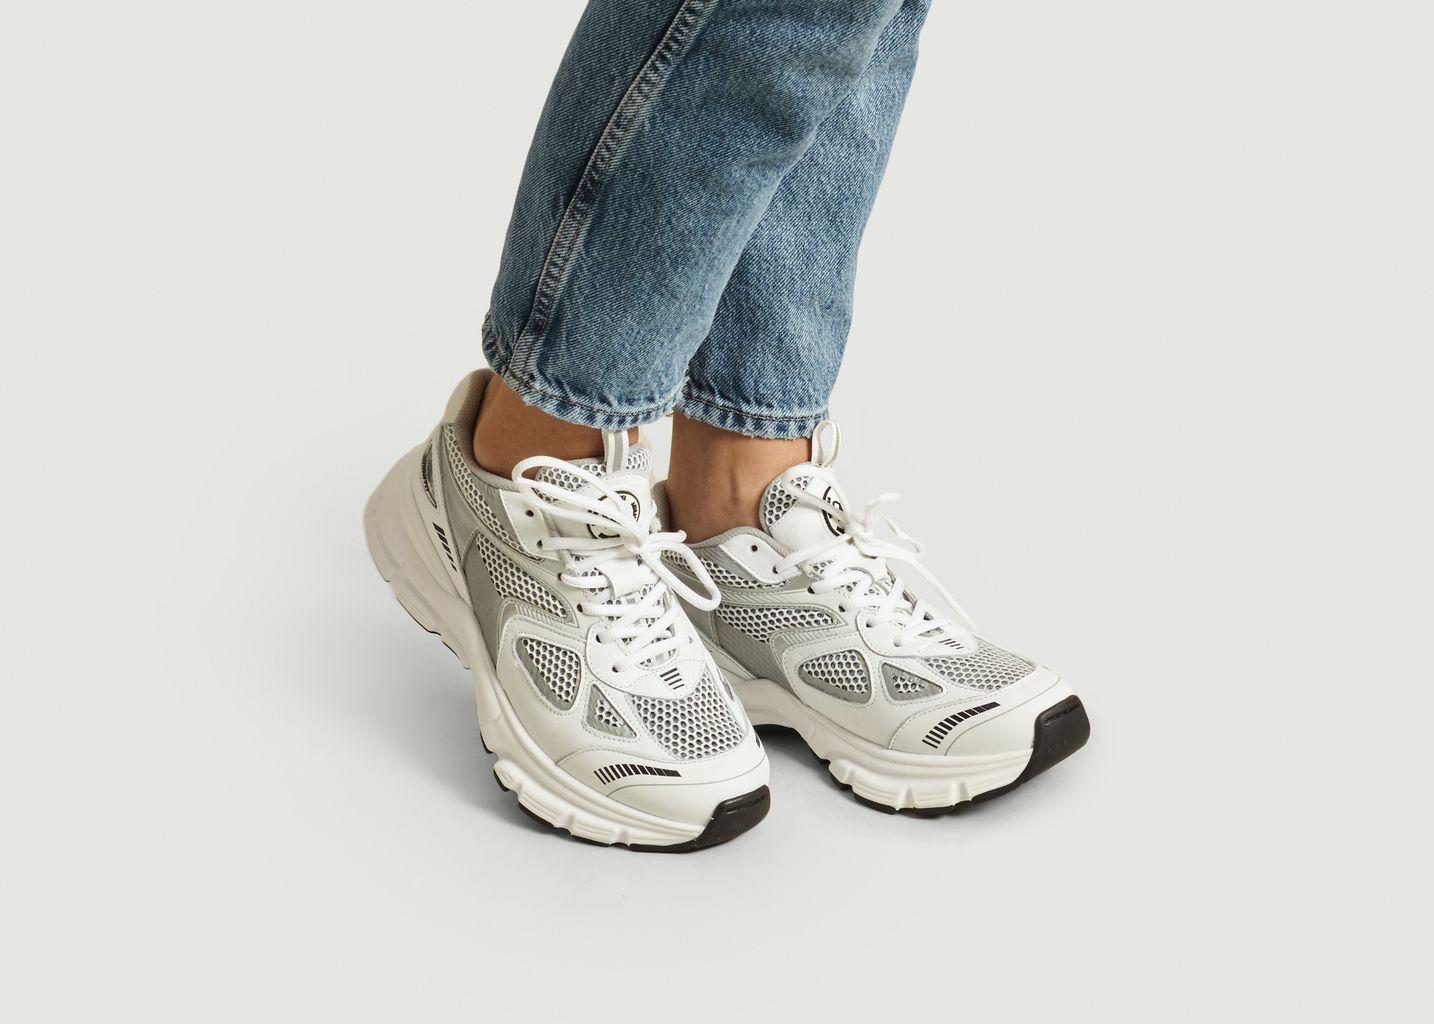 Sneakers Marathon Runner - Axel Arigato